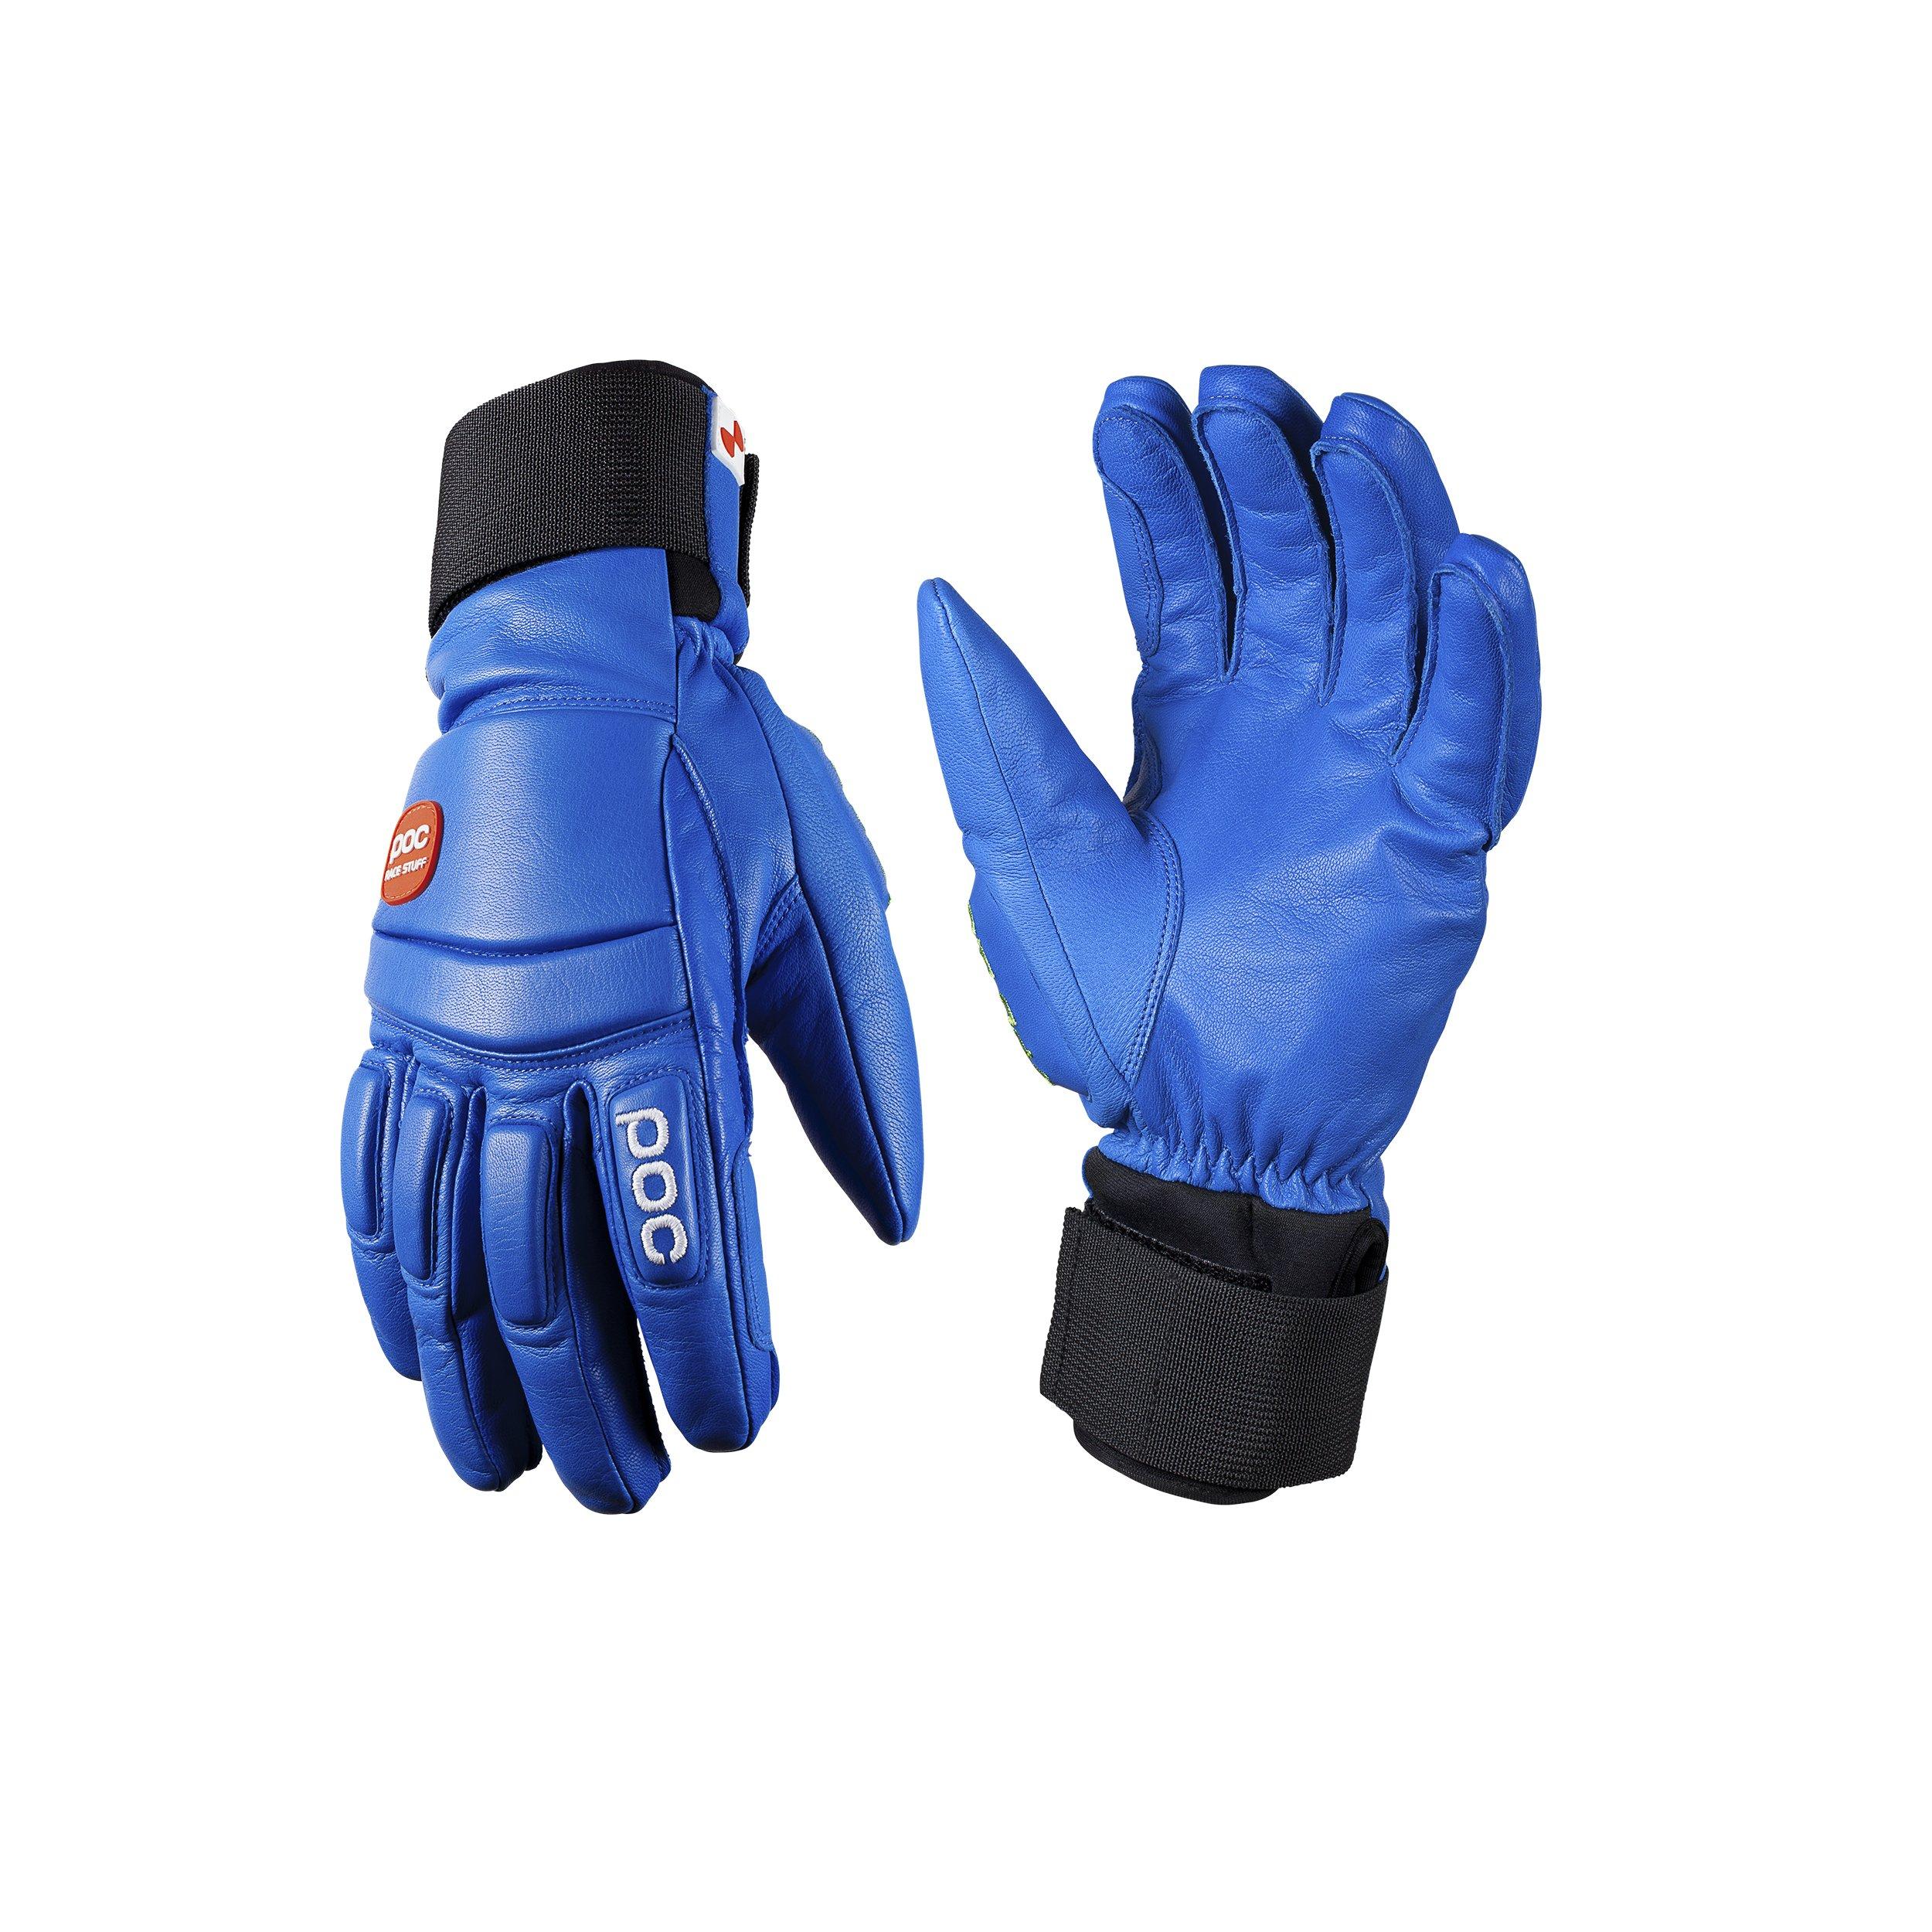 POC Sports Palm Comp VPD 2.0 Glove Califomium Blue Medium